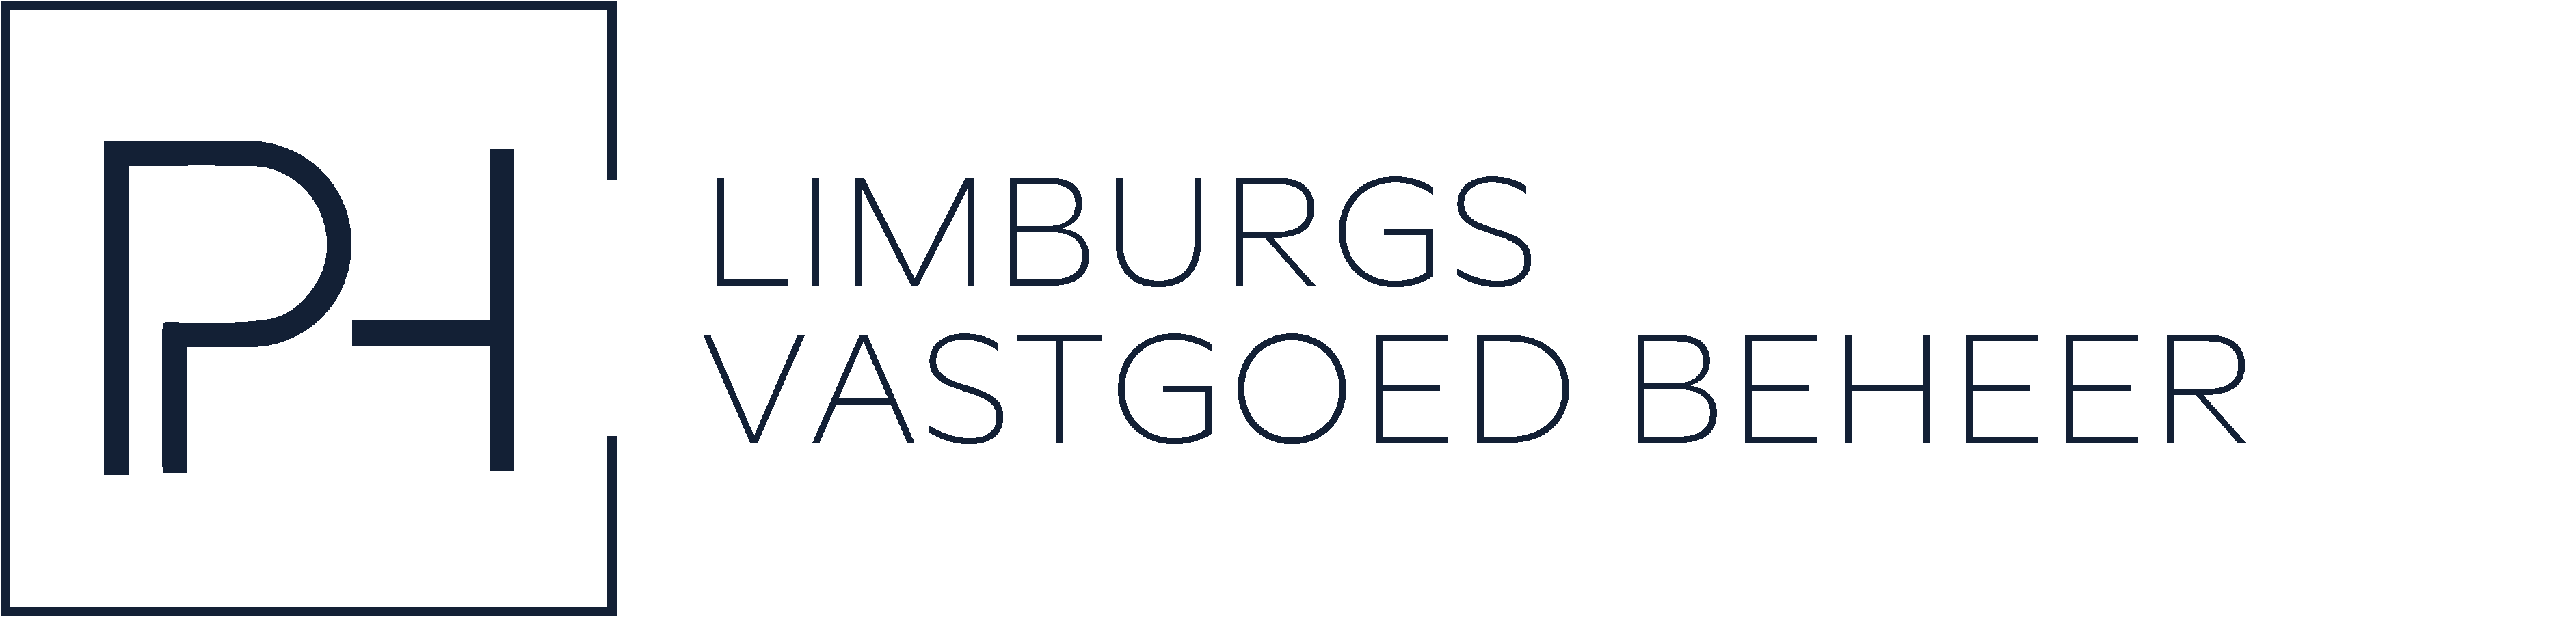 Logo PH. Limburgsvastgoedbeheer blauw